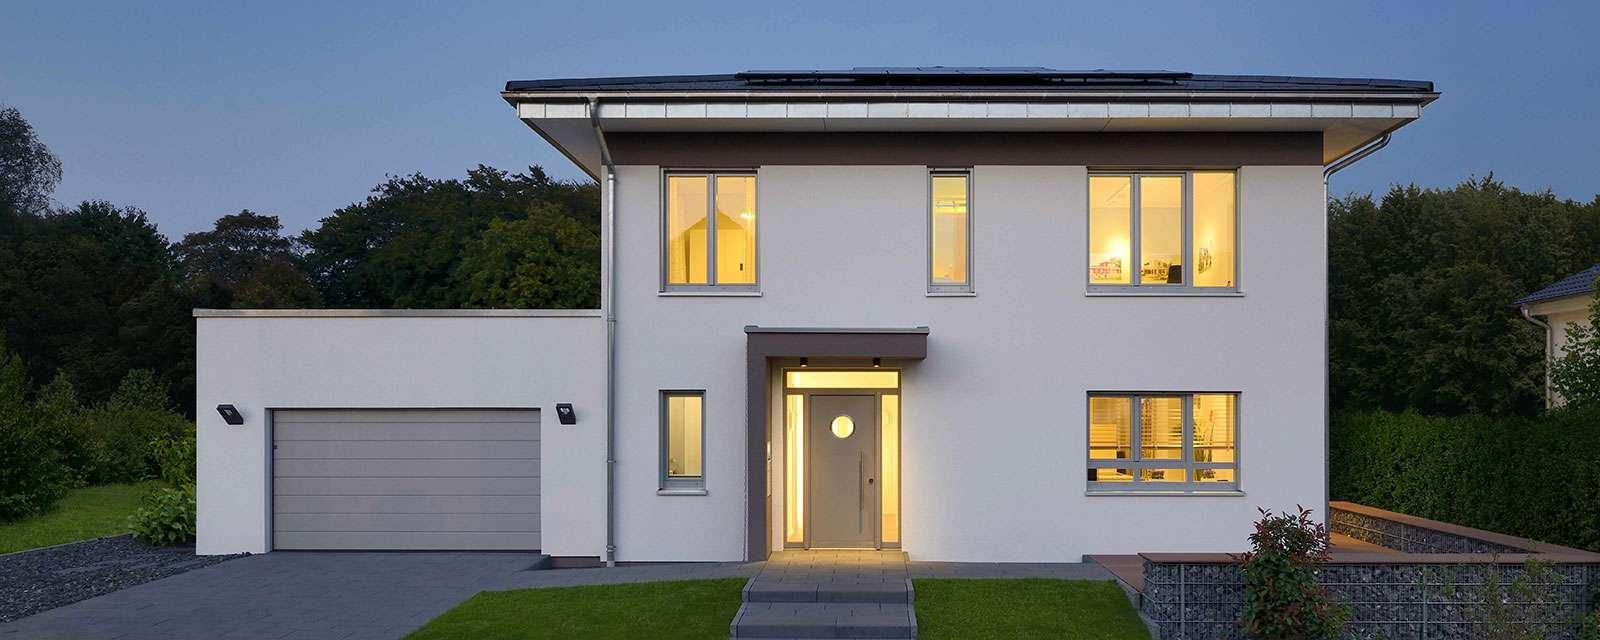 Musterhaus stadtvilla mit garage  KAMPA - Musterhaus Wuppertal